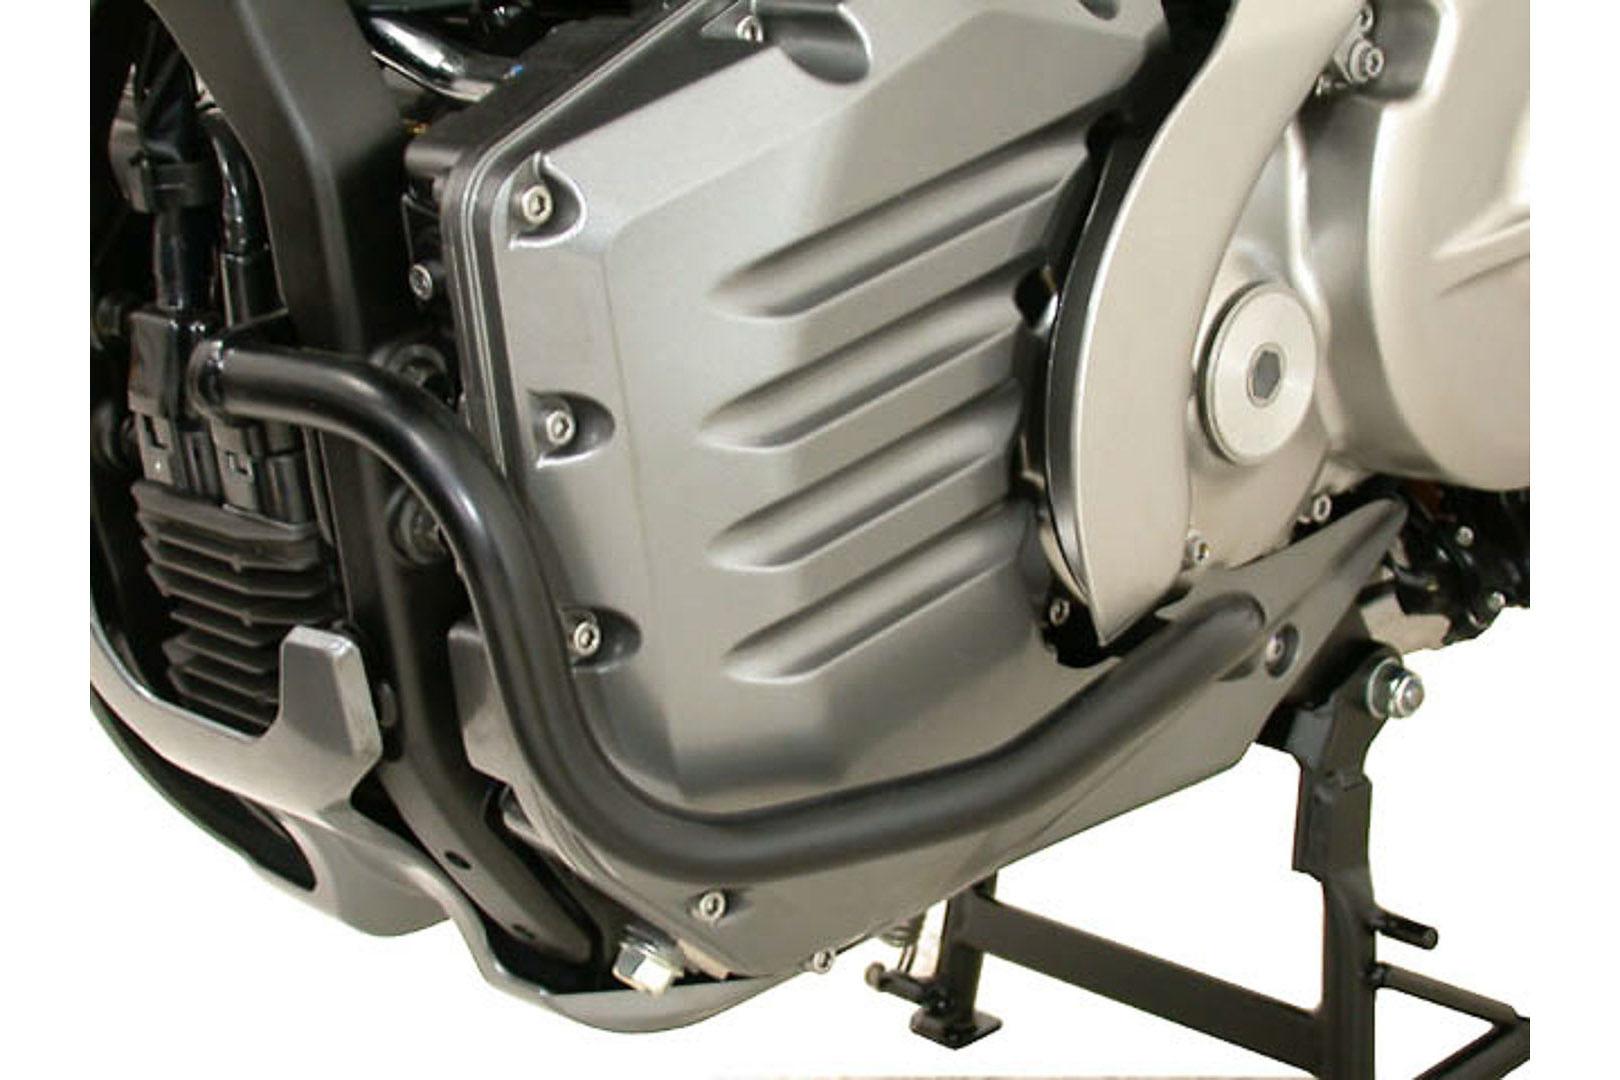 SW-Motech Moottorinsuojarauta Yamaha MT-01 musta